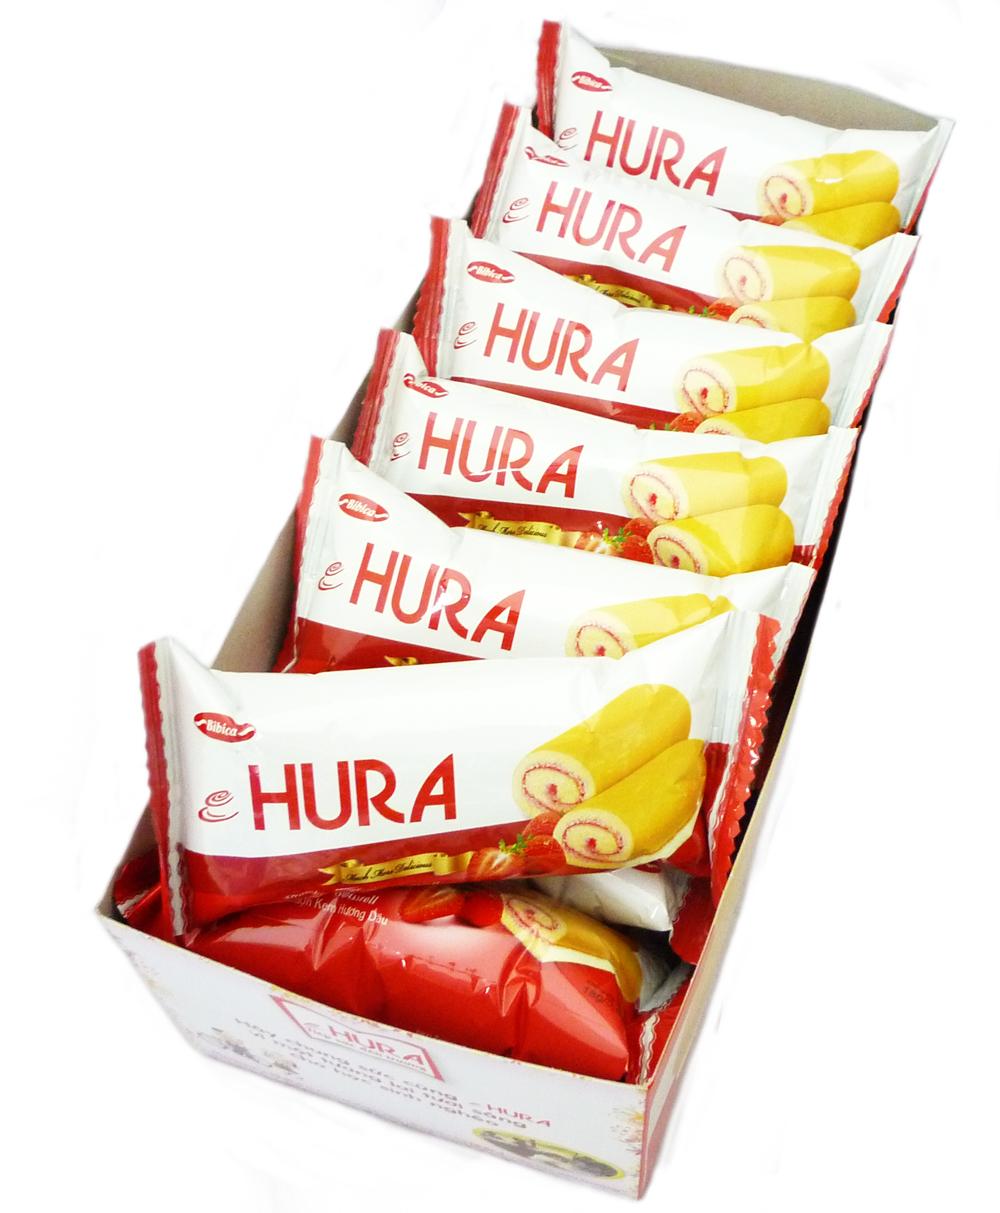 HURA 迷你瑞士捲(草莓味) 360g整盒